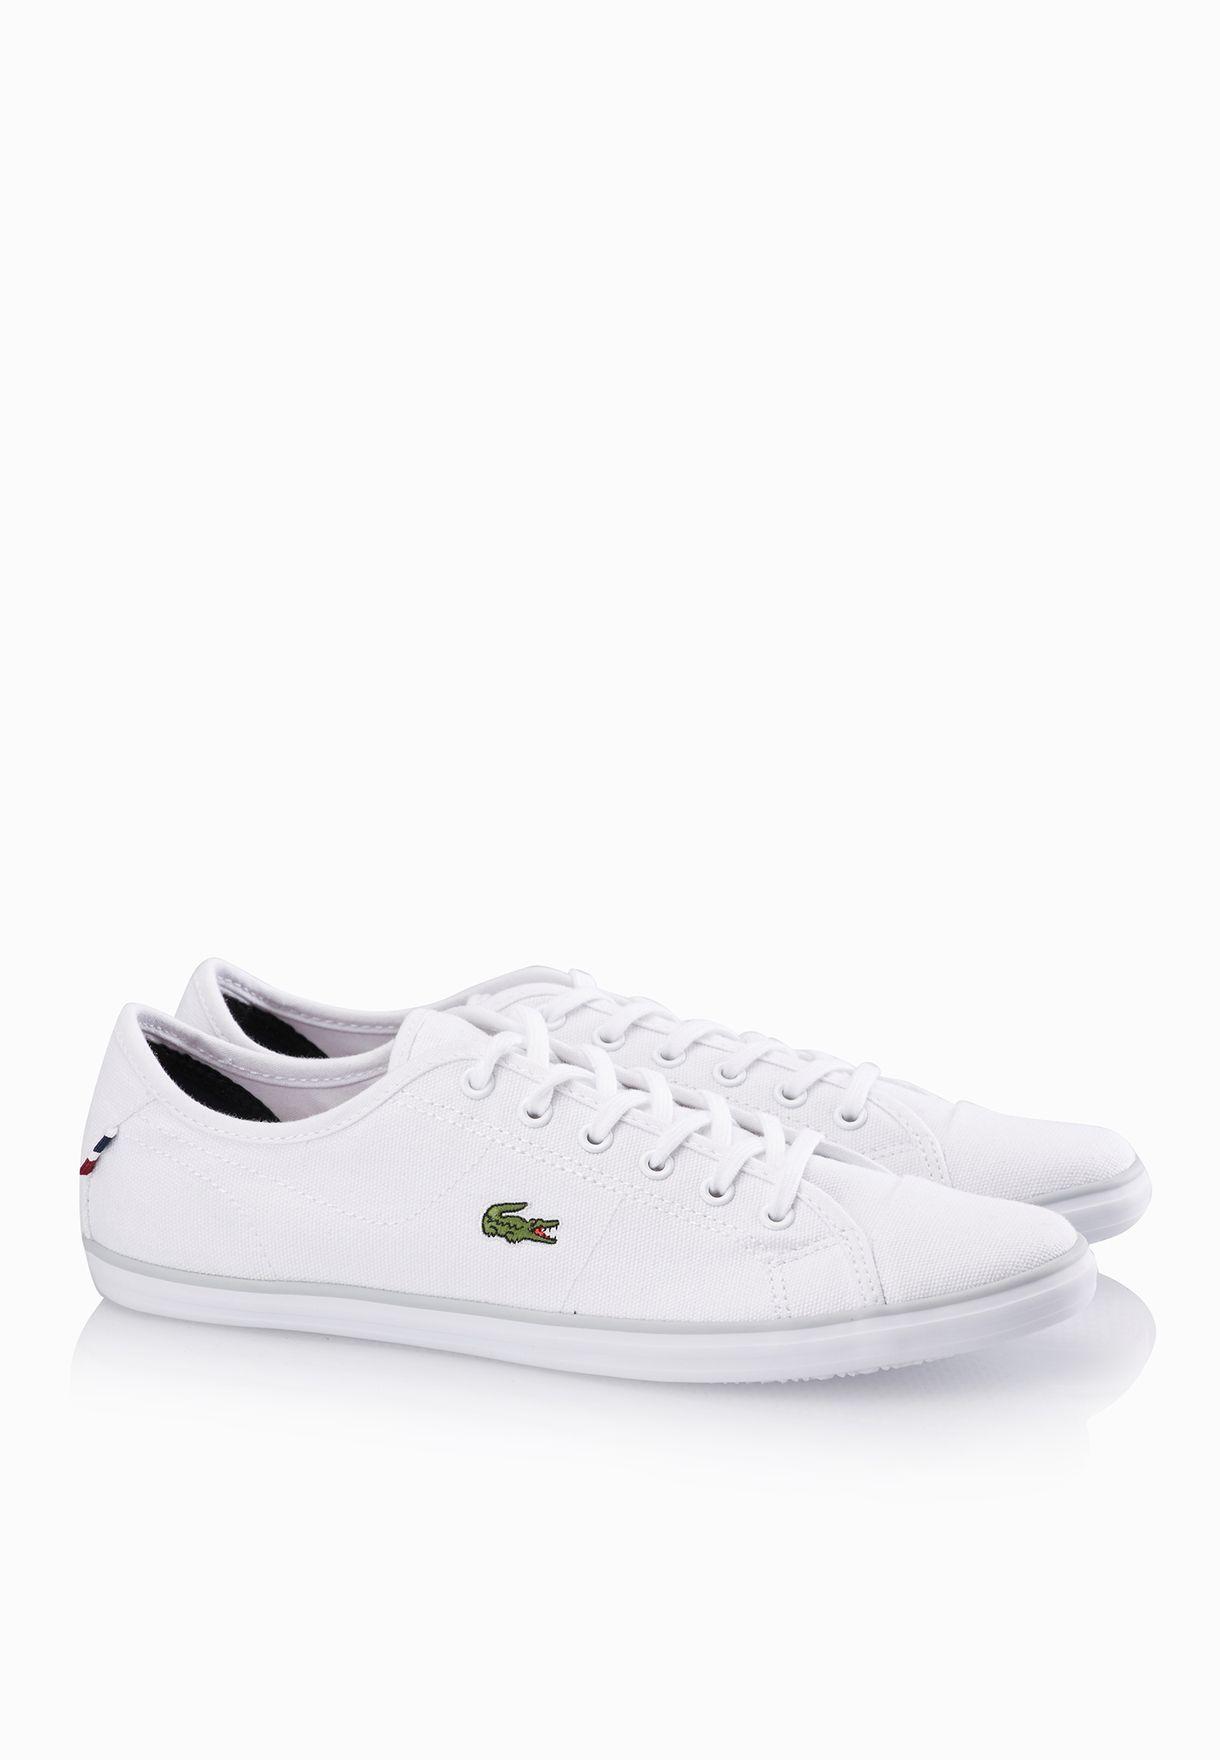 629c4cec5 Shop Lacoste white Ziane TRC Sneakers 30SPW0028-21G for Women in ...